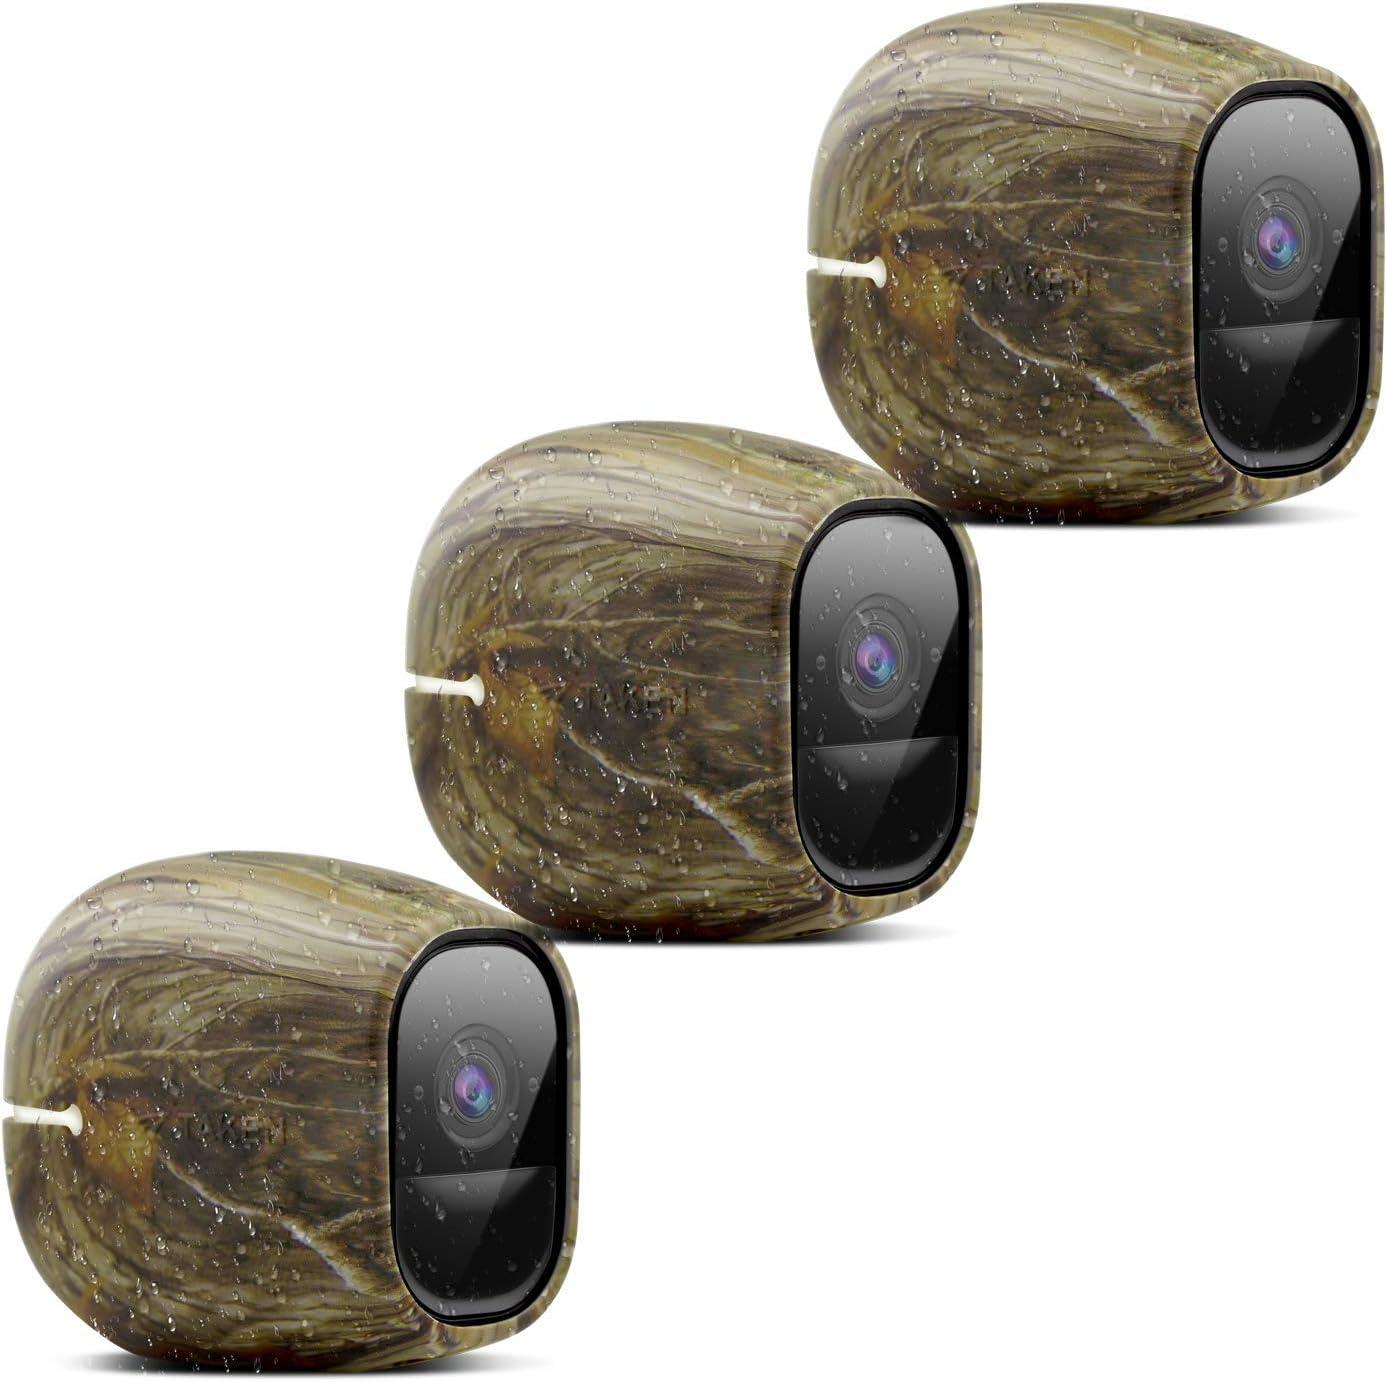 Silikon Schutzhüllen Kompatibel Mit Arlo Pro Und Arlo Kamera